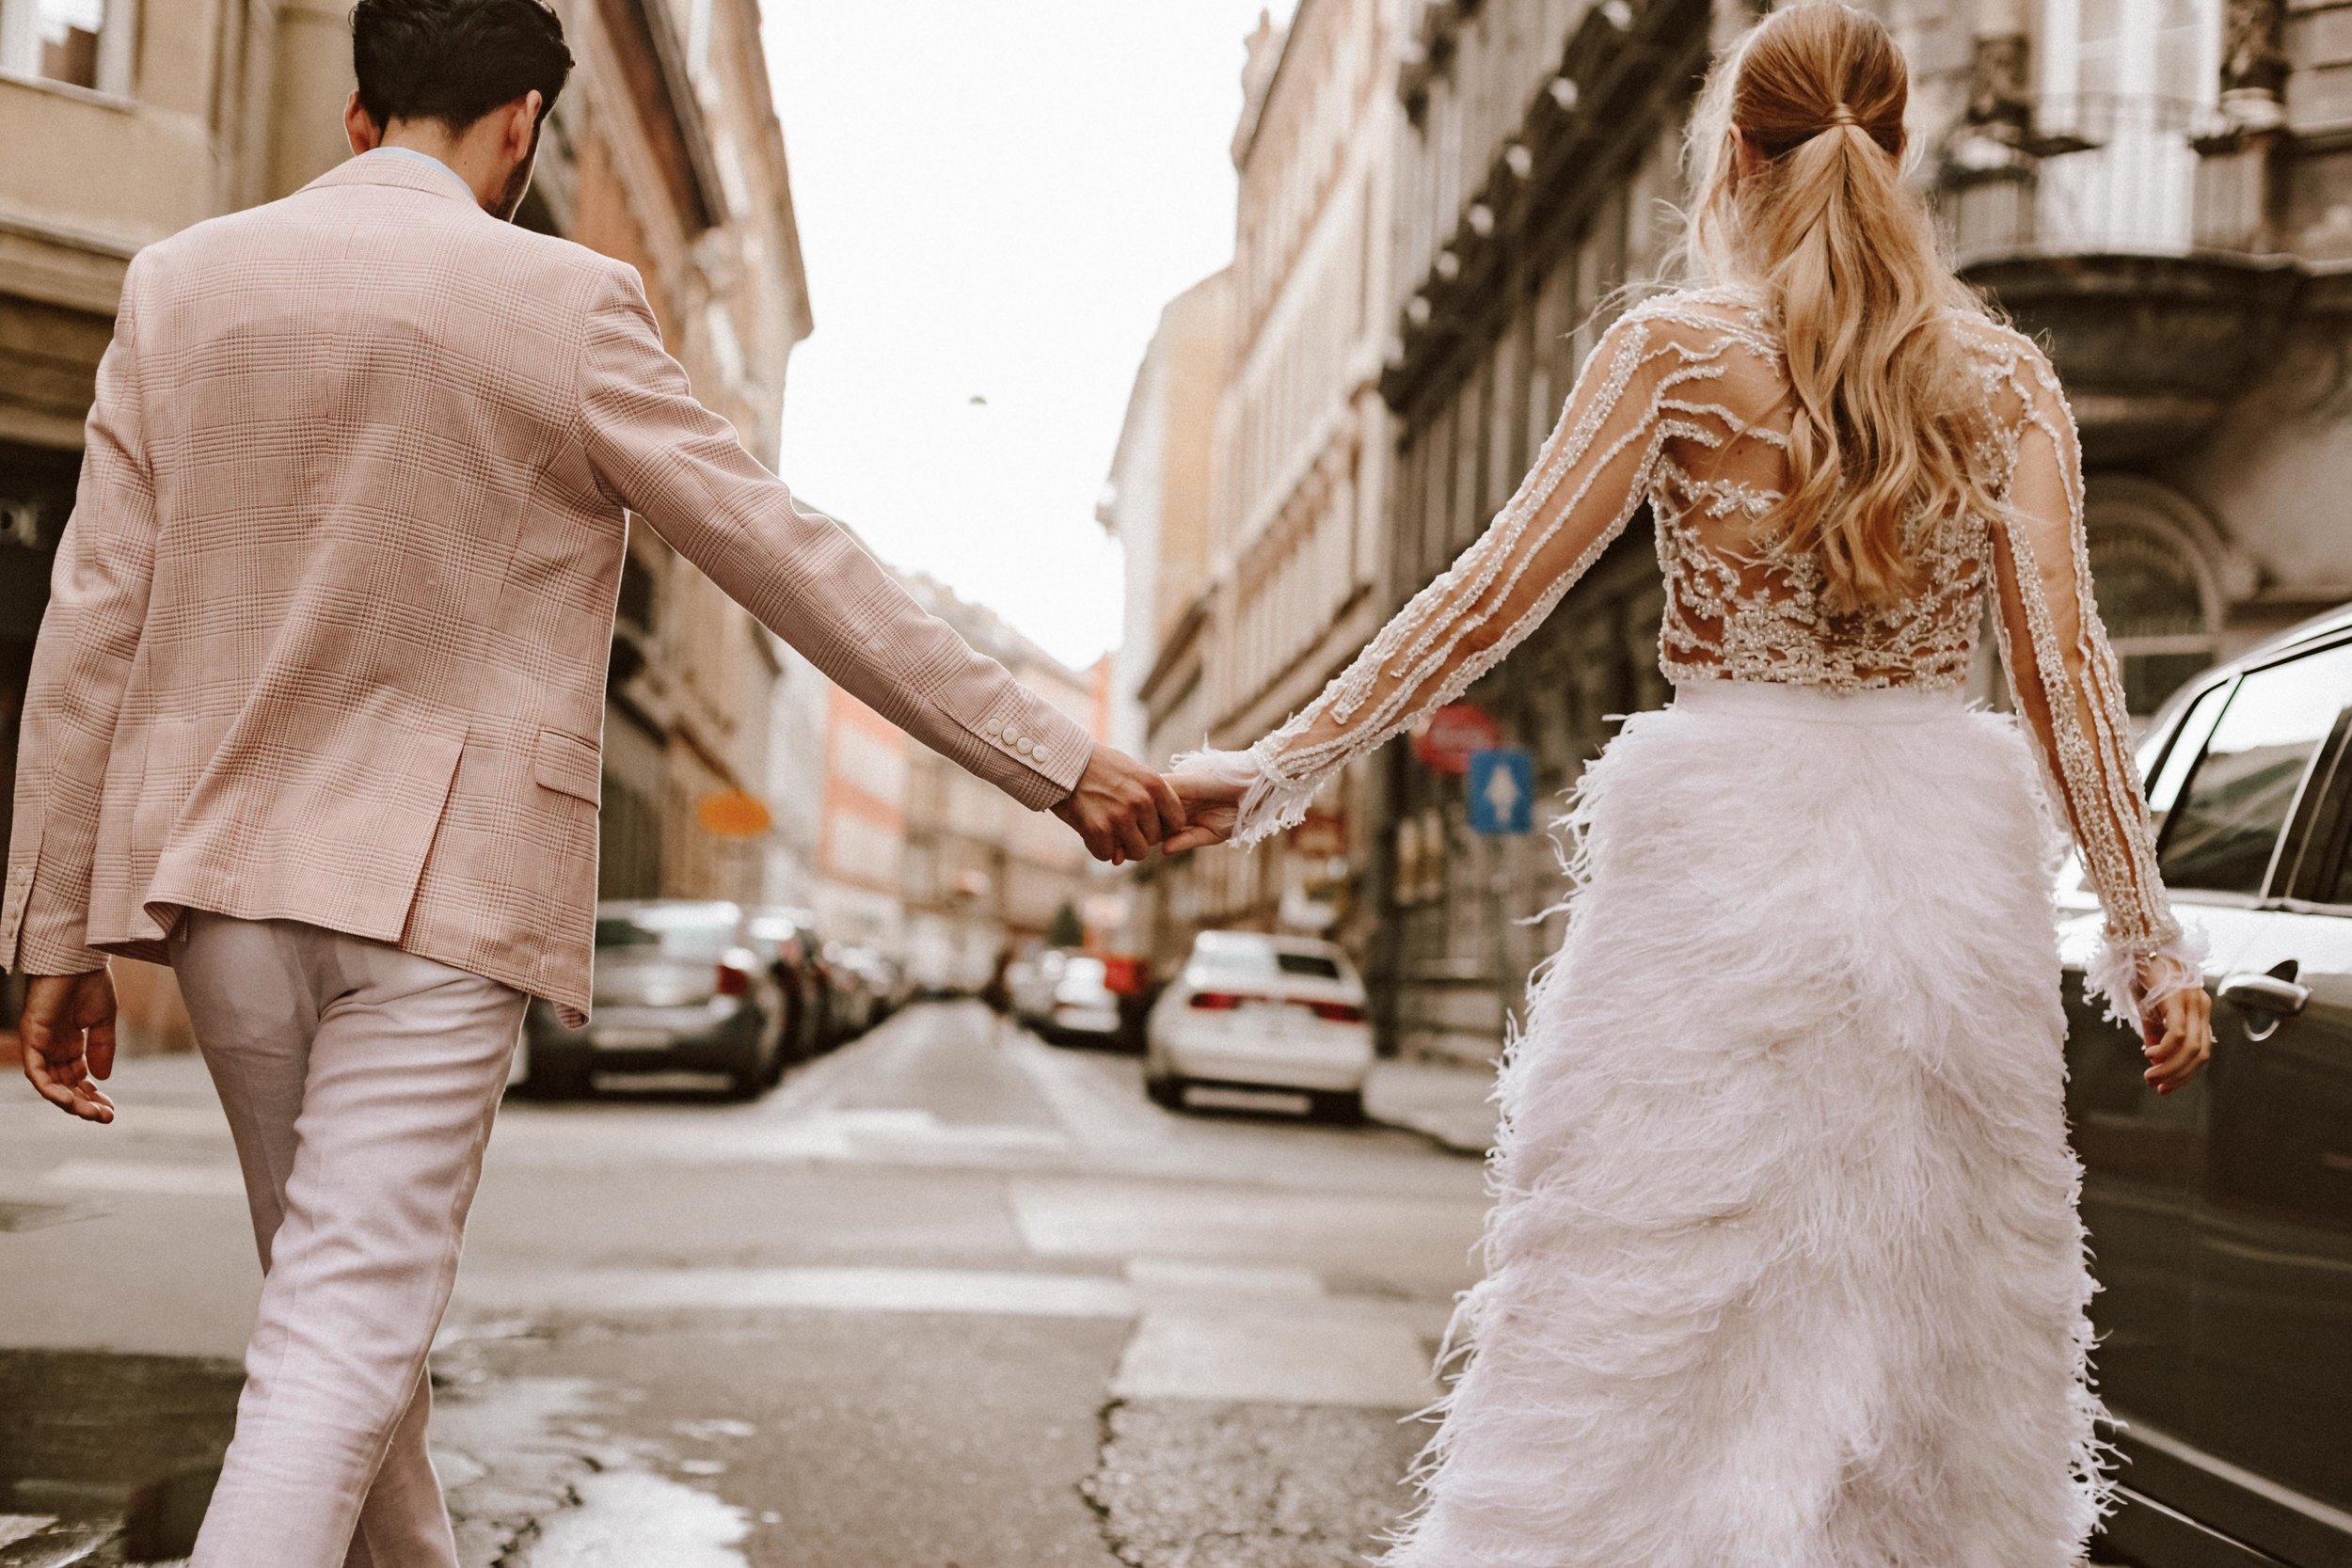 1819-Evelin+Peti-wedding-050-w.jpg